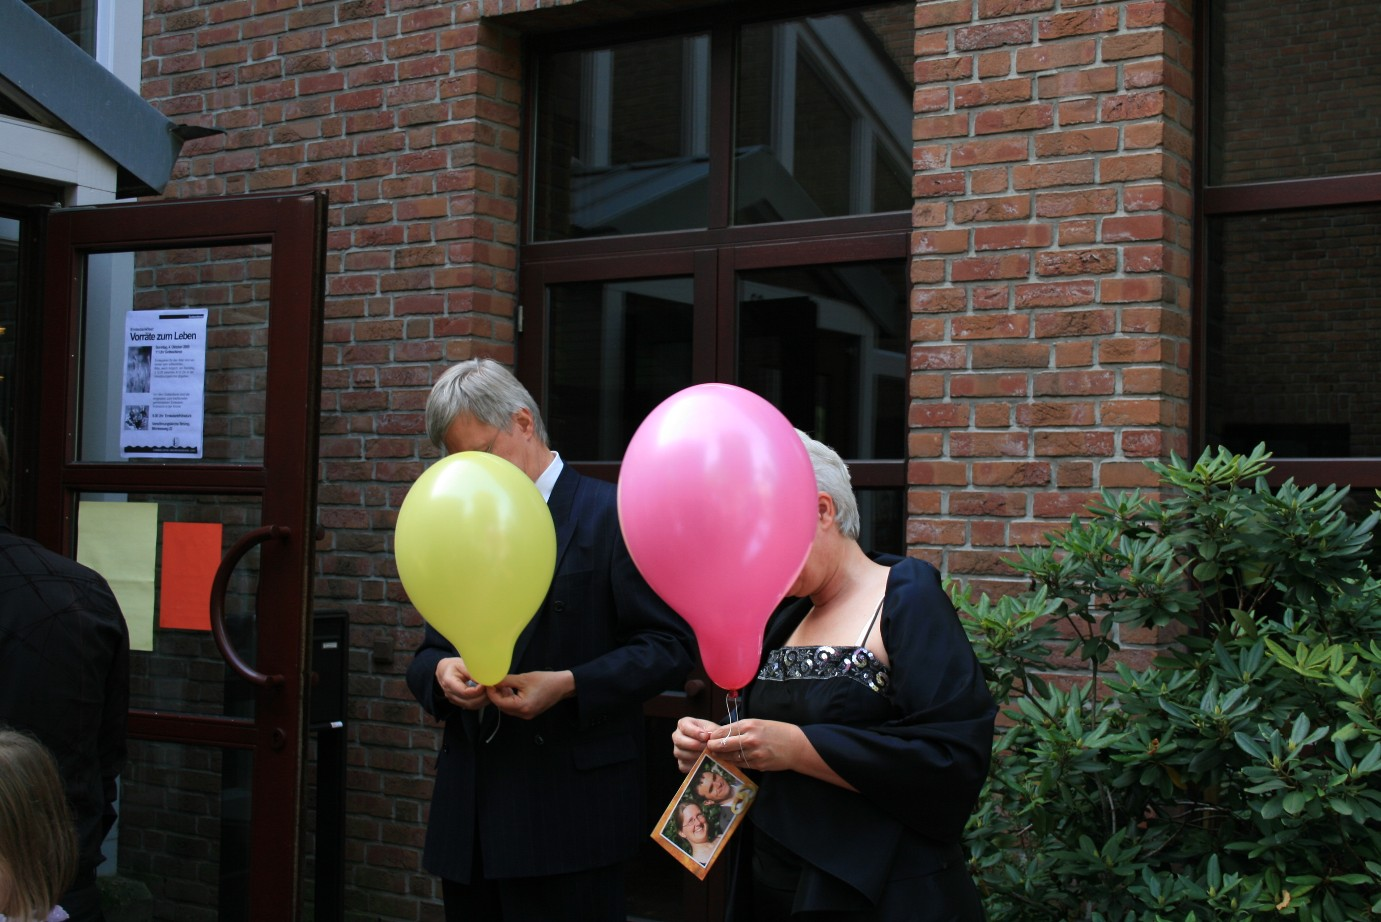 Die kirchliche trauung for Luftballons duisburg